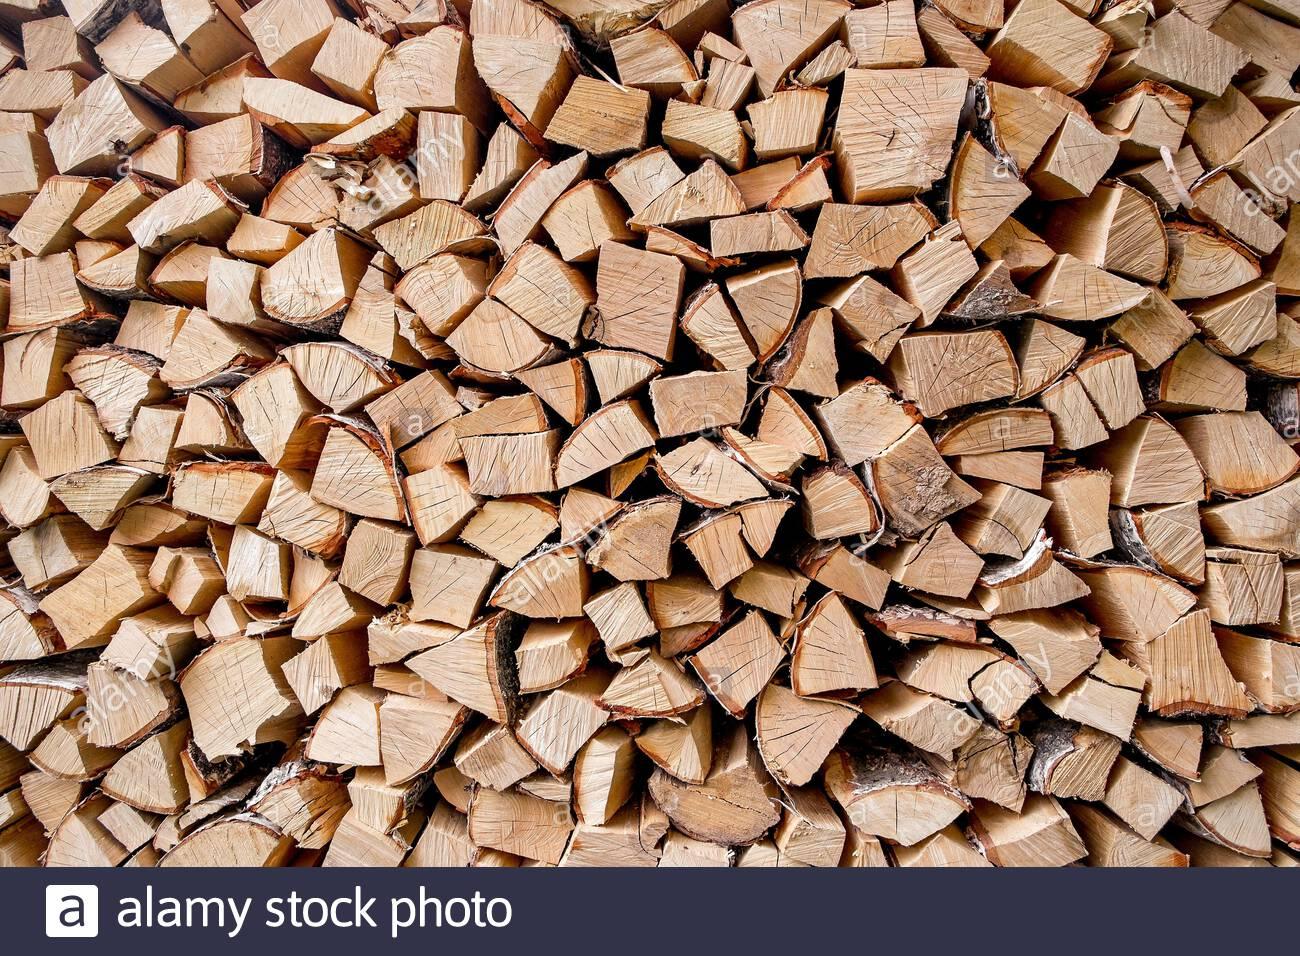 A lot of firewood background Stock Photo 337683008   Alamy 1300x956